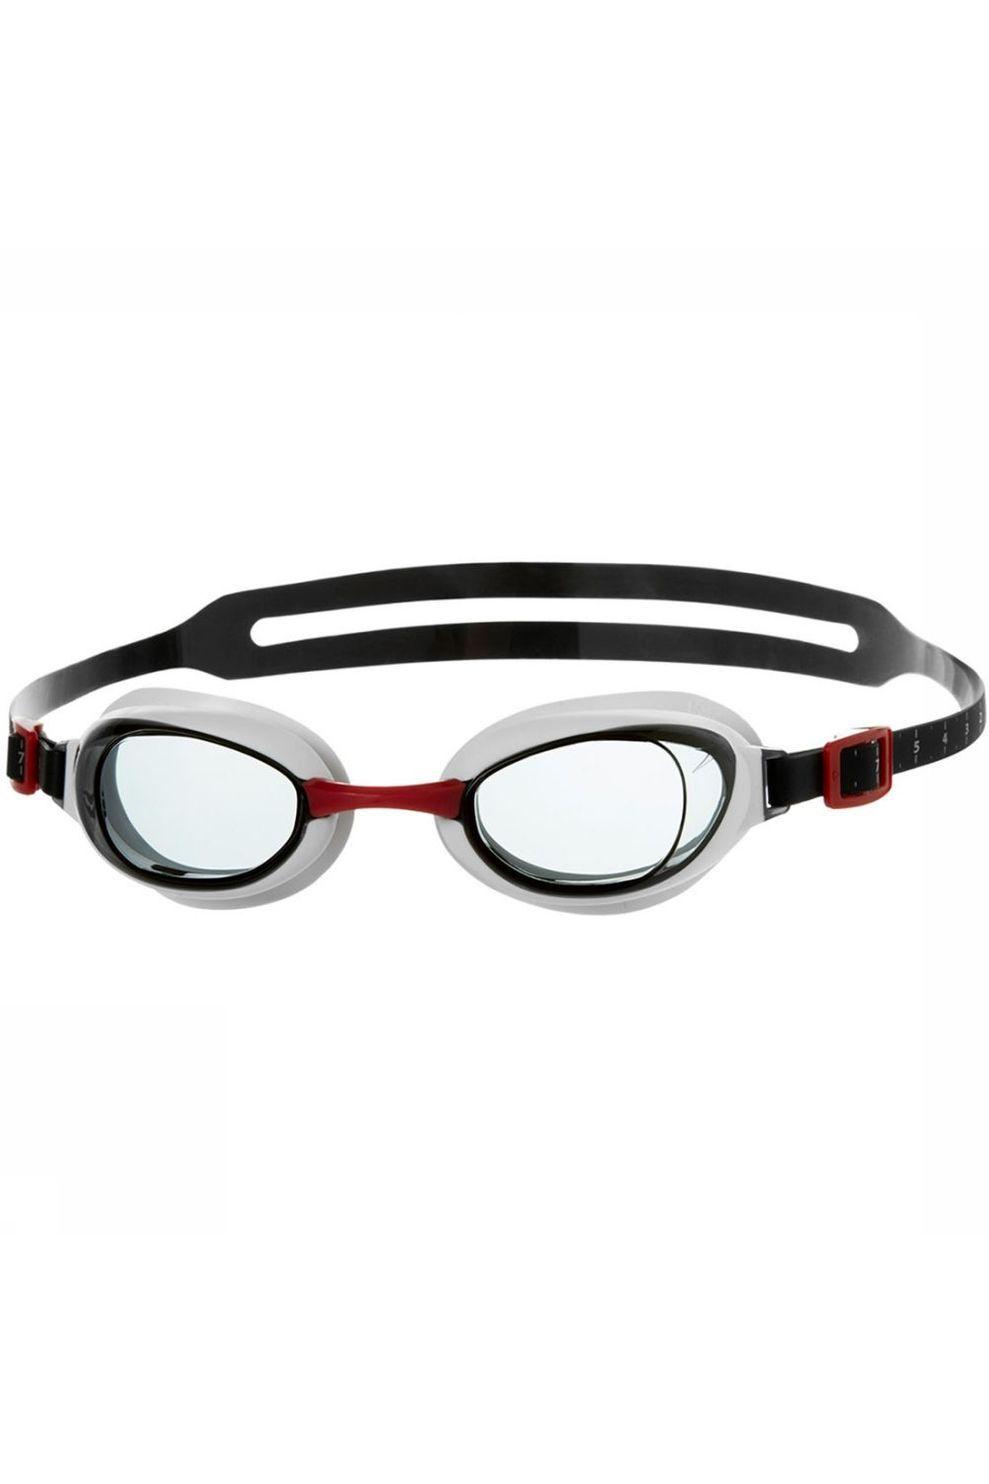 Speedo Aquapure Zwembril Steen/Rood